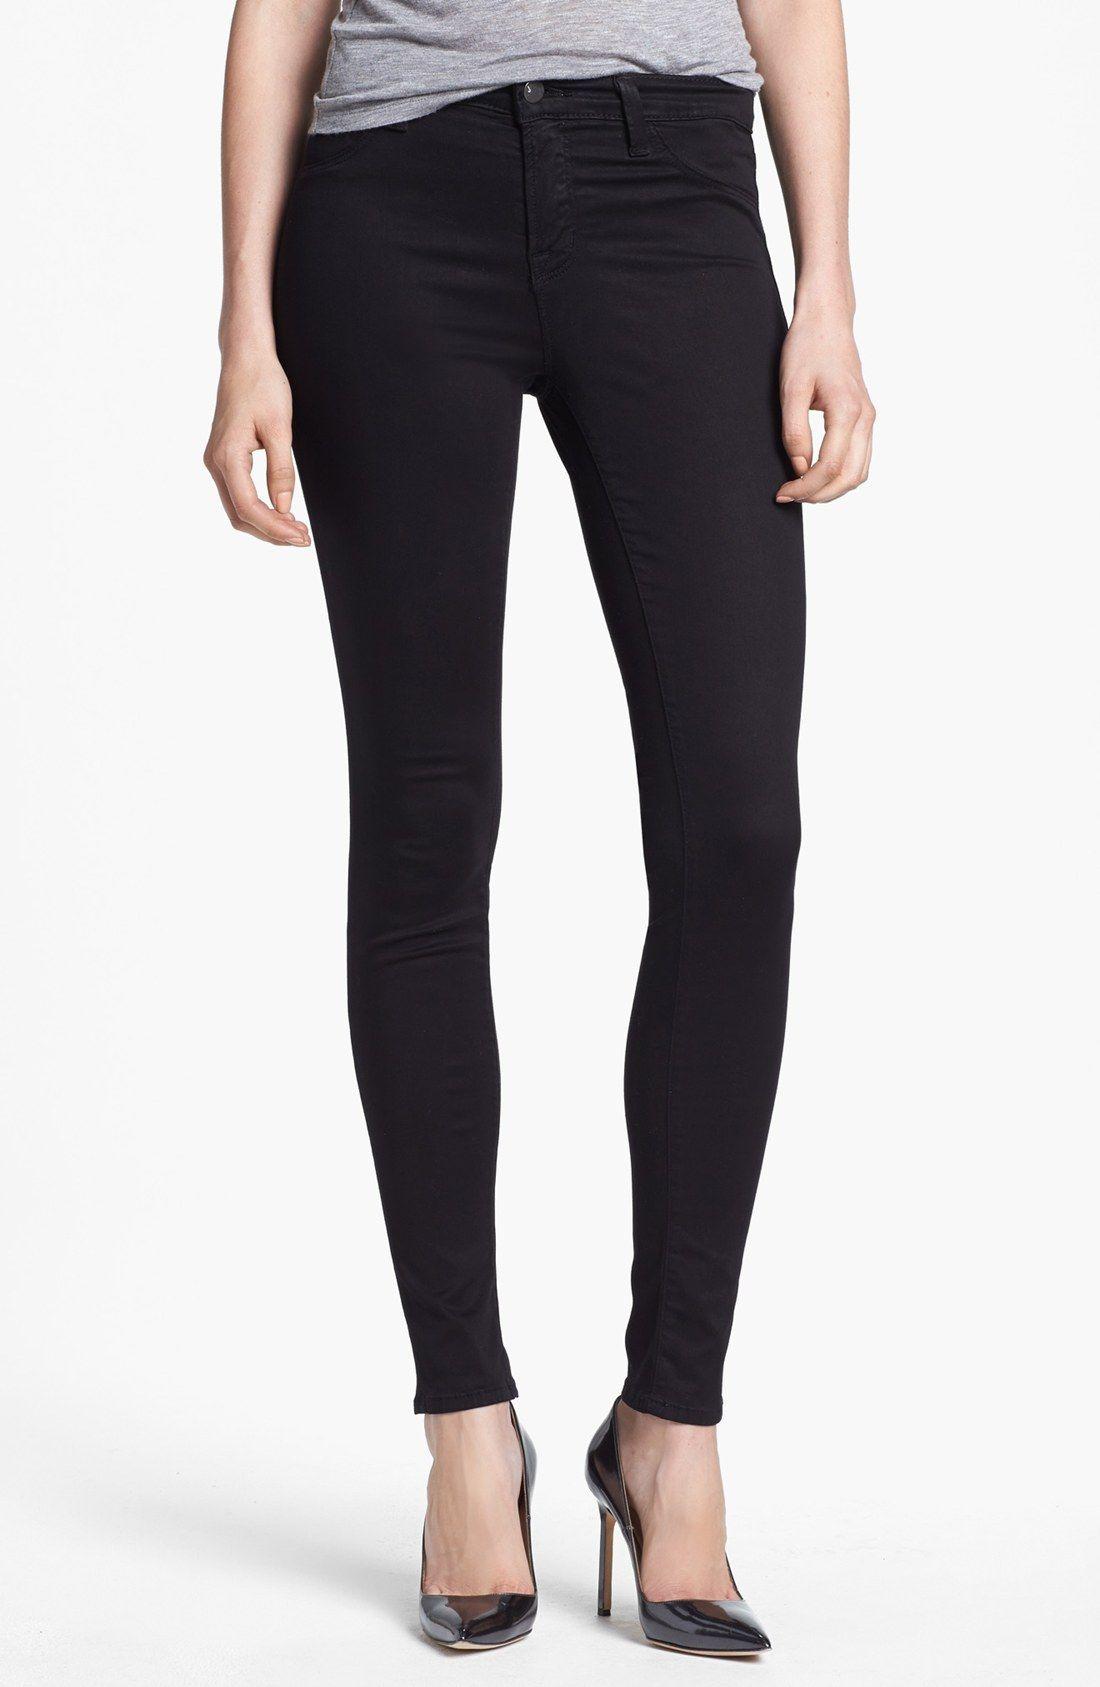 485 mid rise super skinny jeans